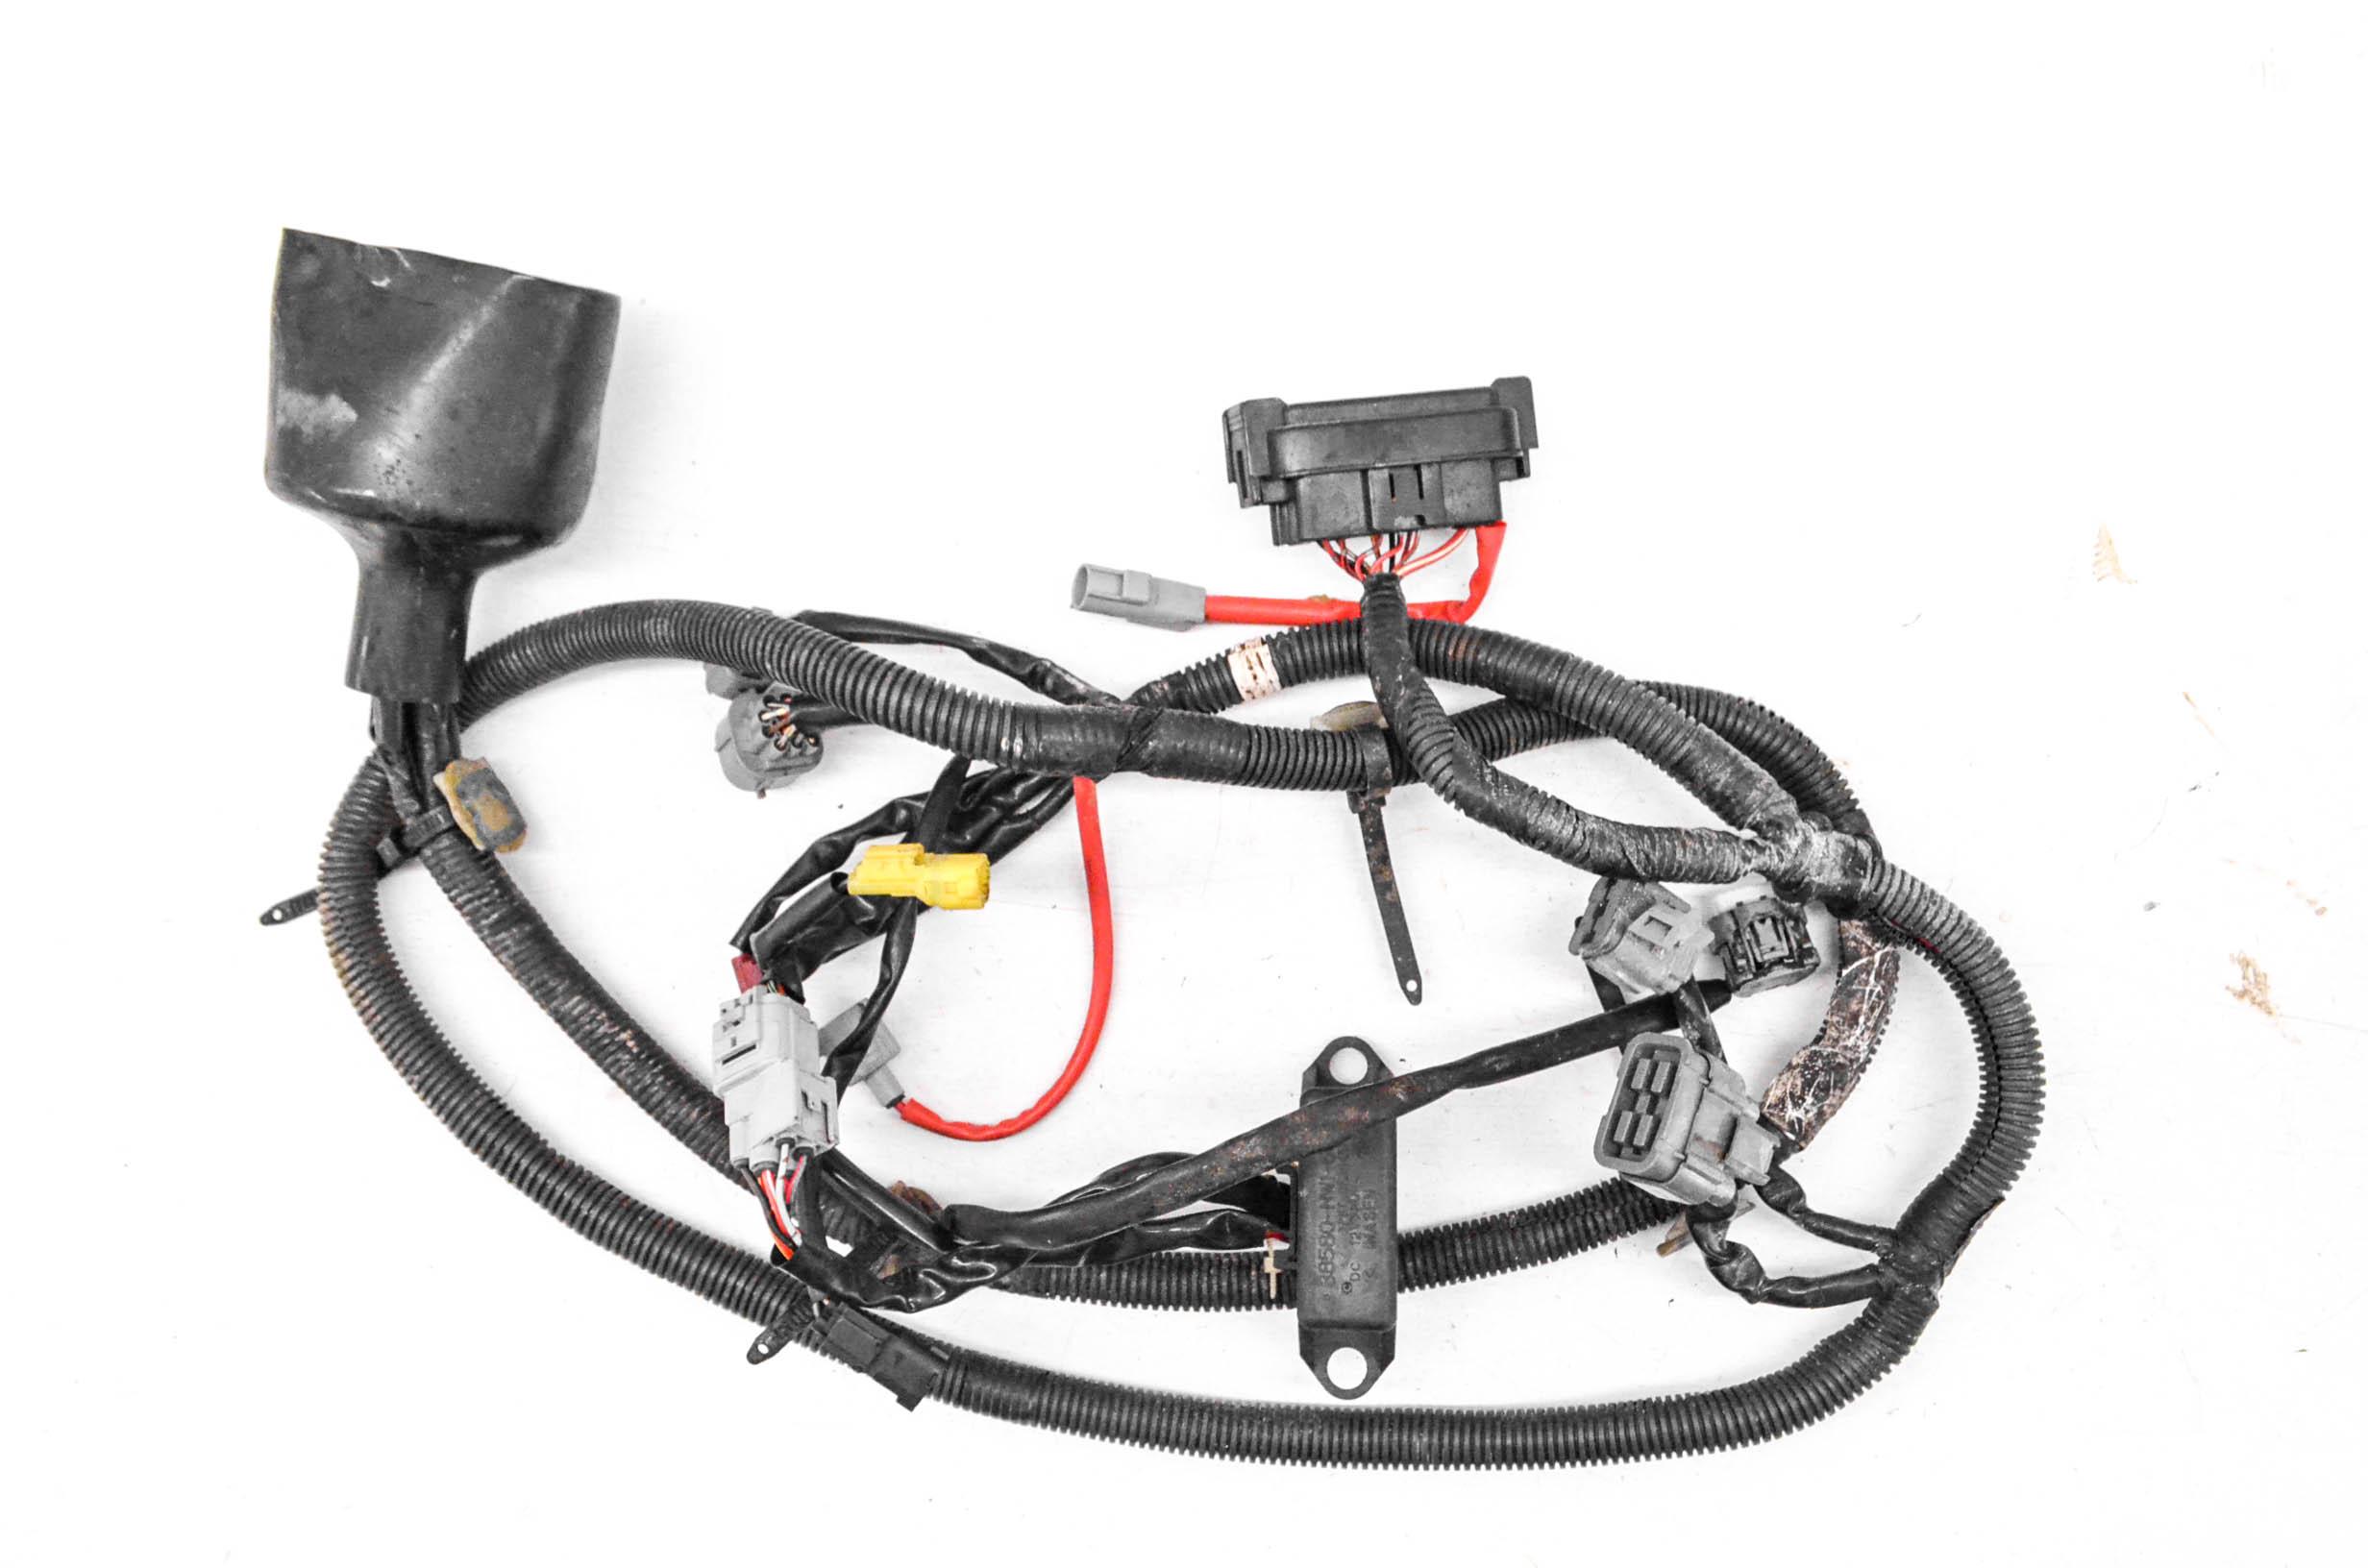 04 Honda Aquatrax F-12X Main Wire Harness Electrical